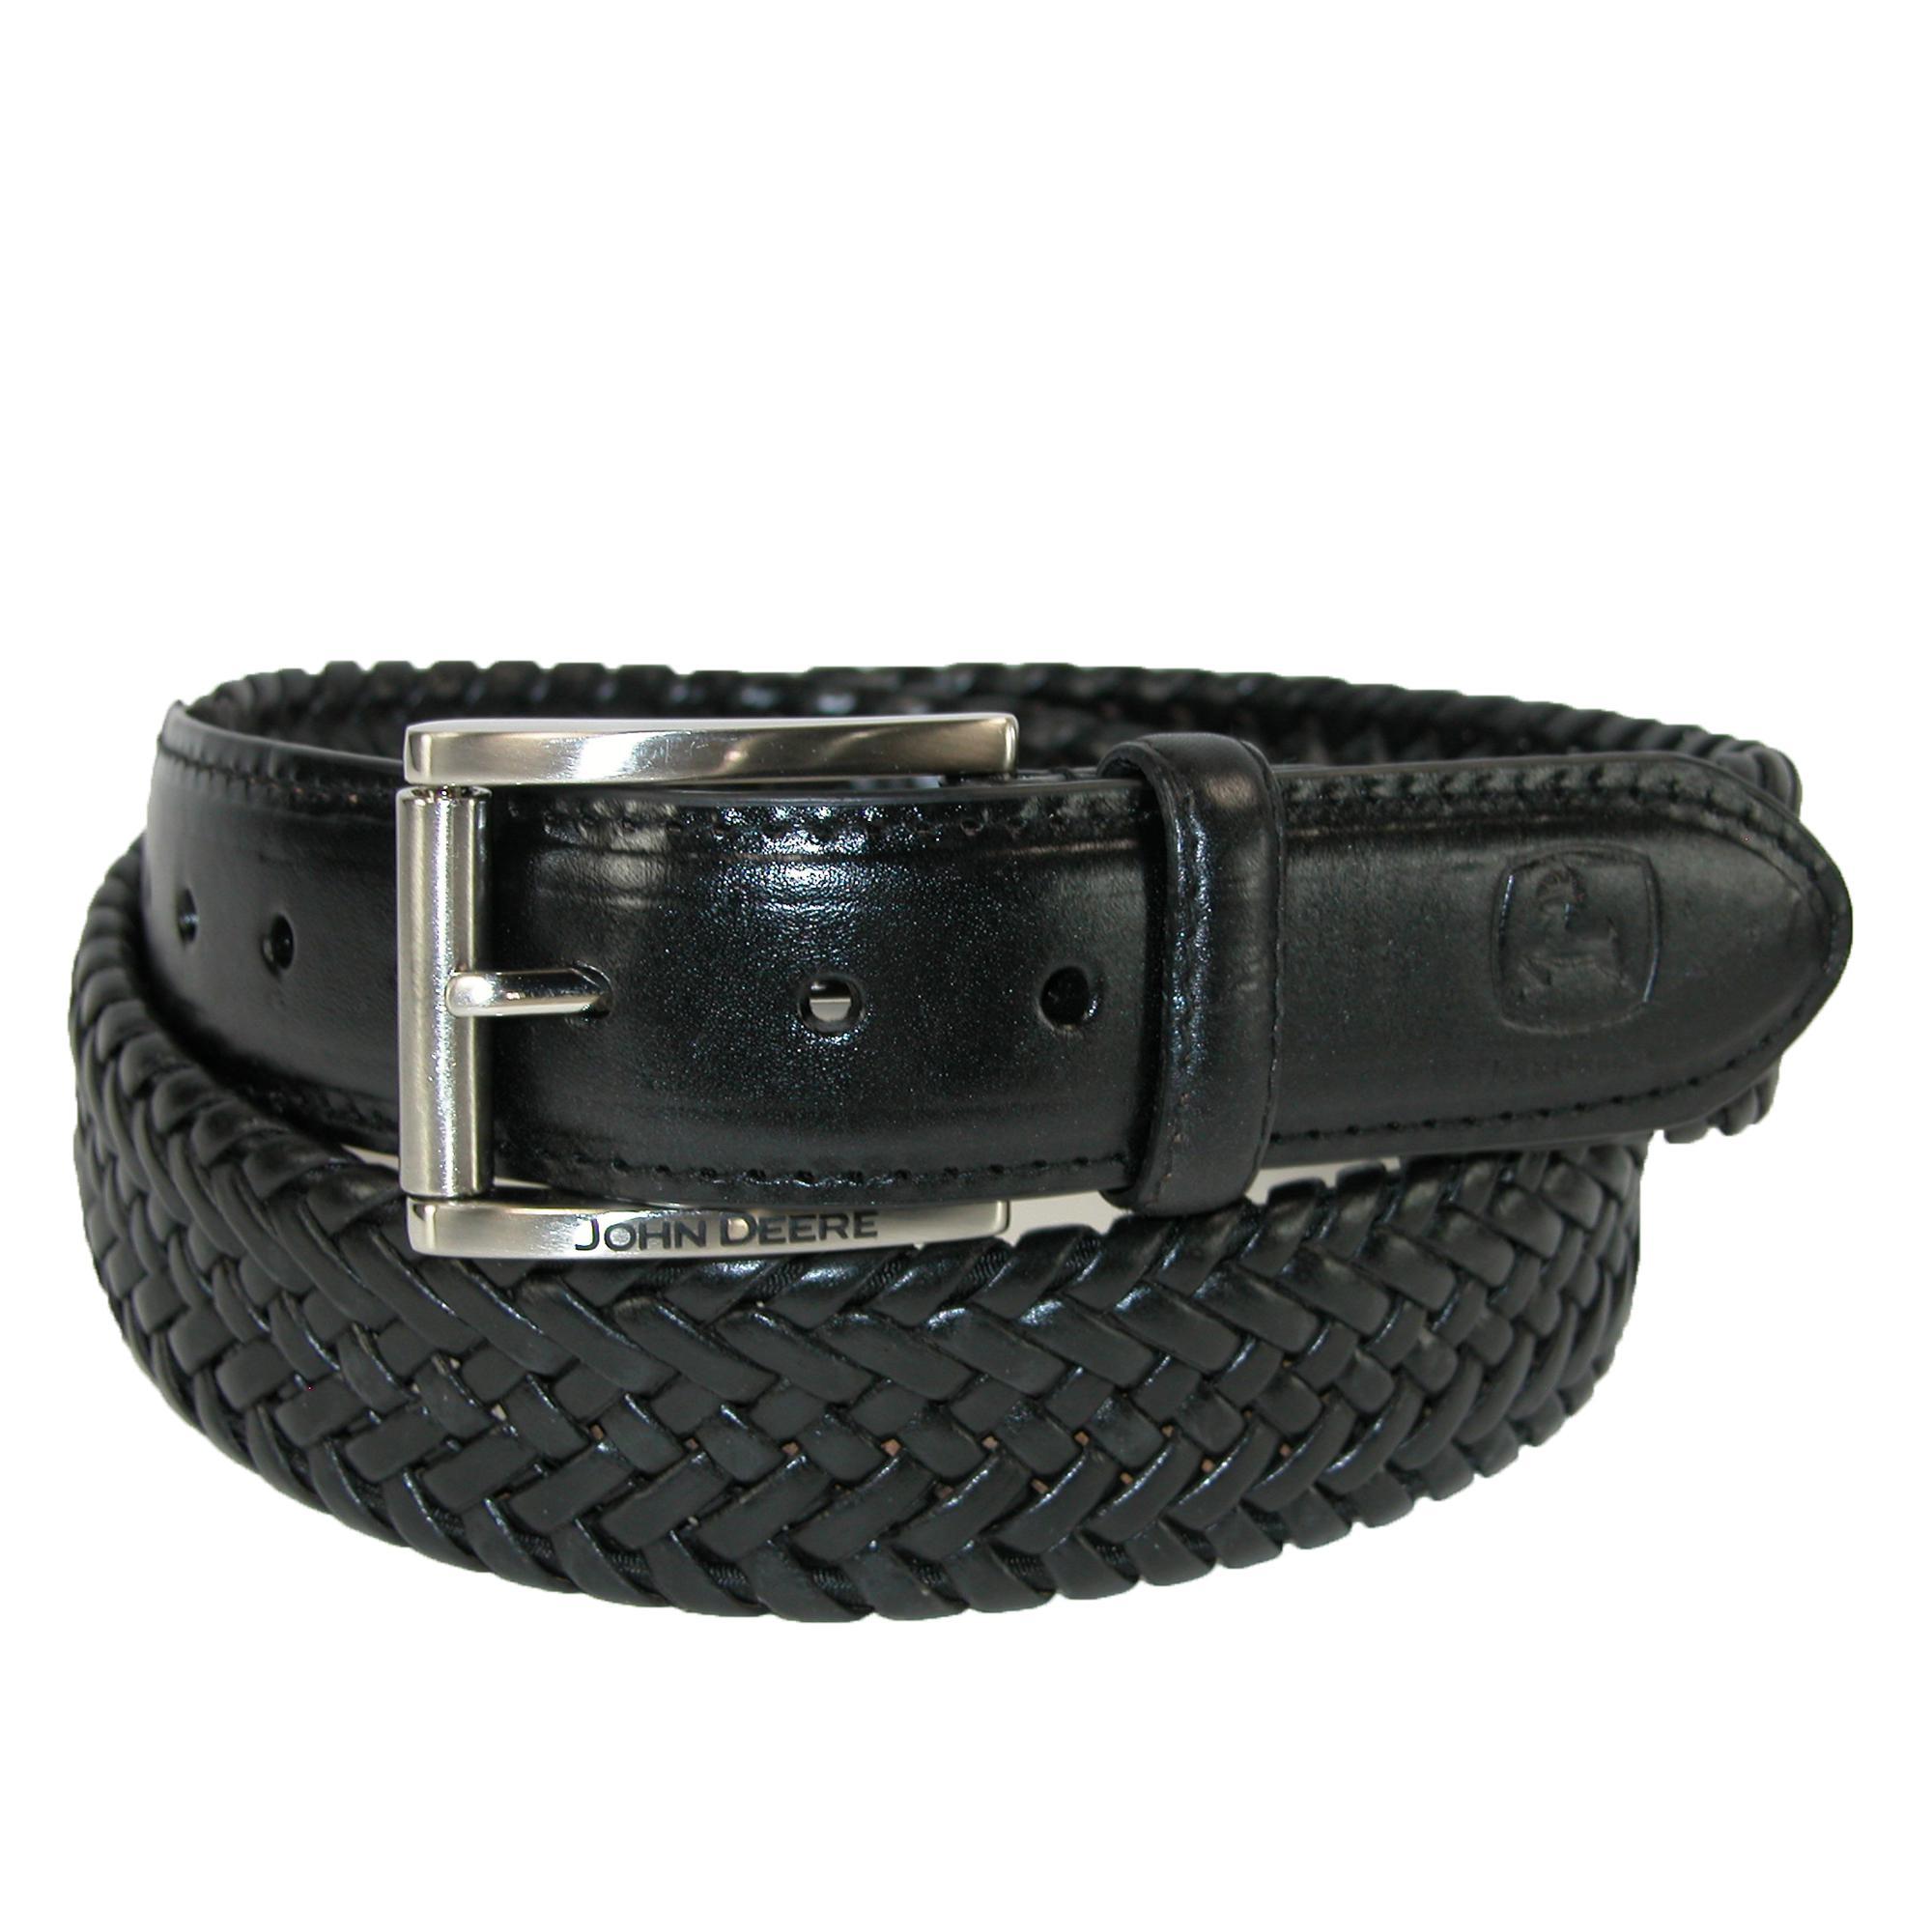 John Deere Mens Leather Braided Stretch Belt